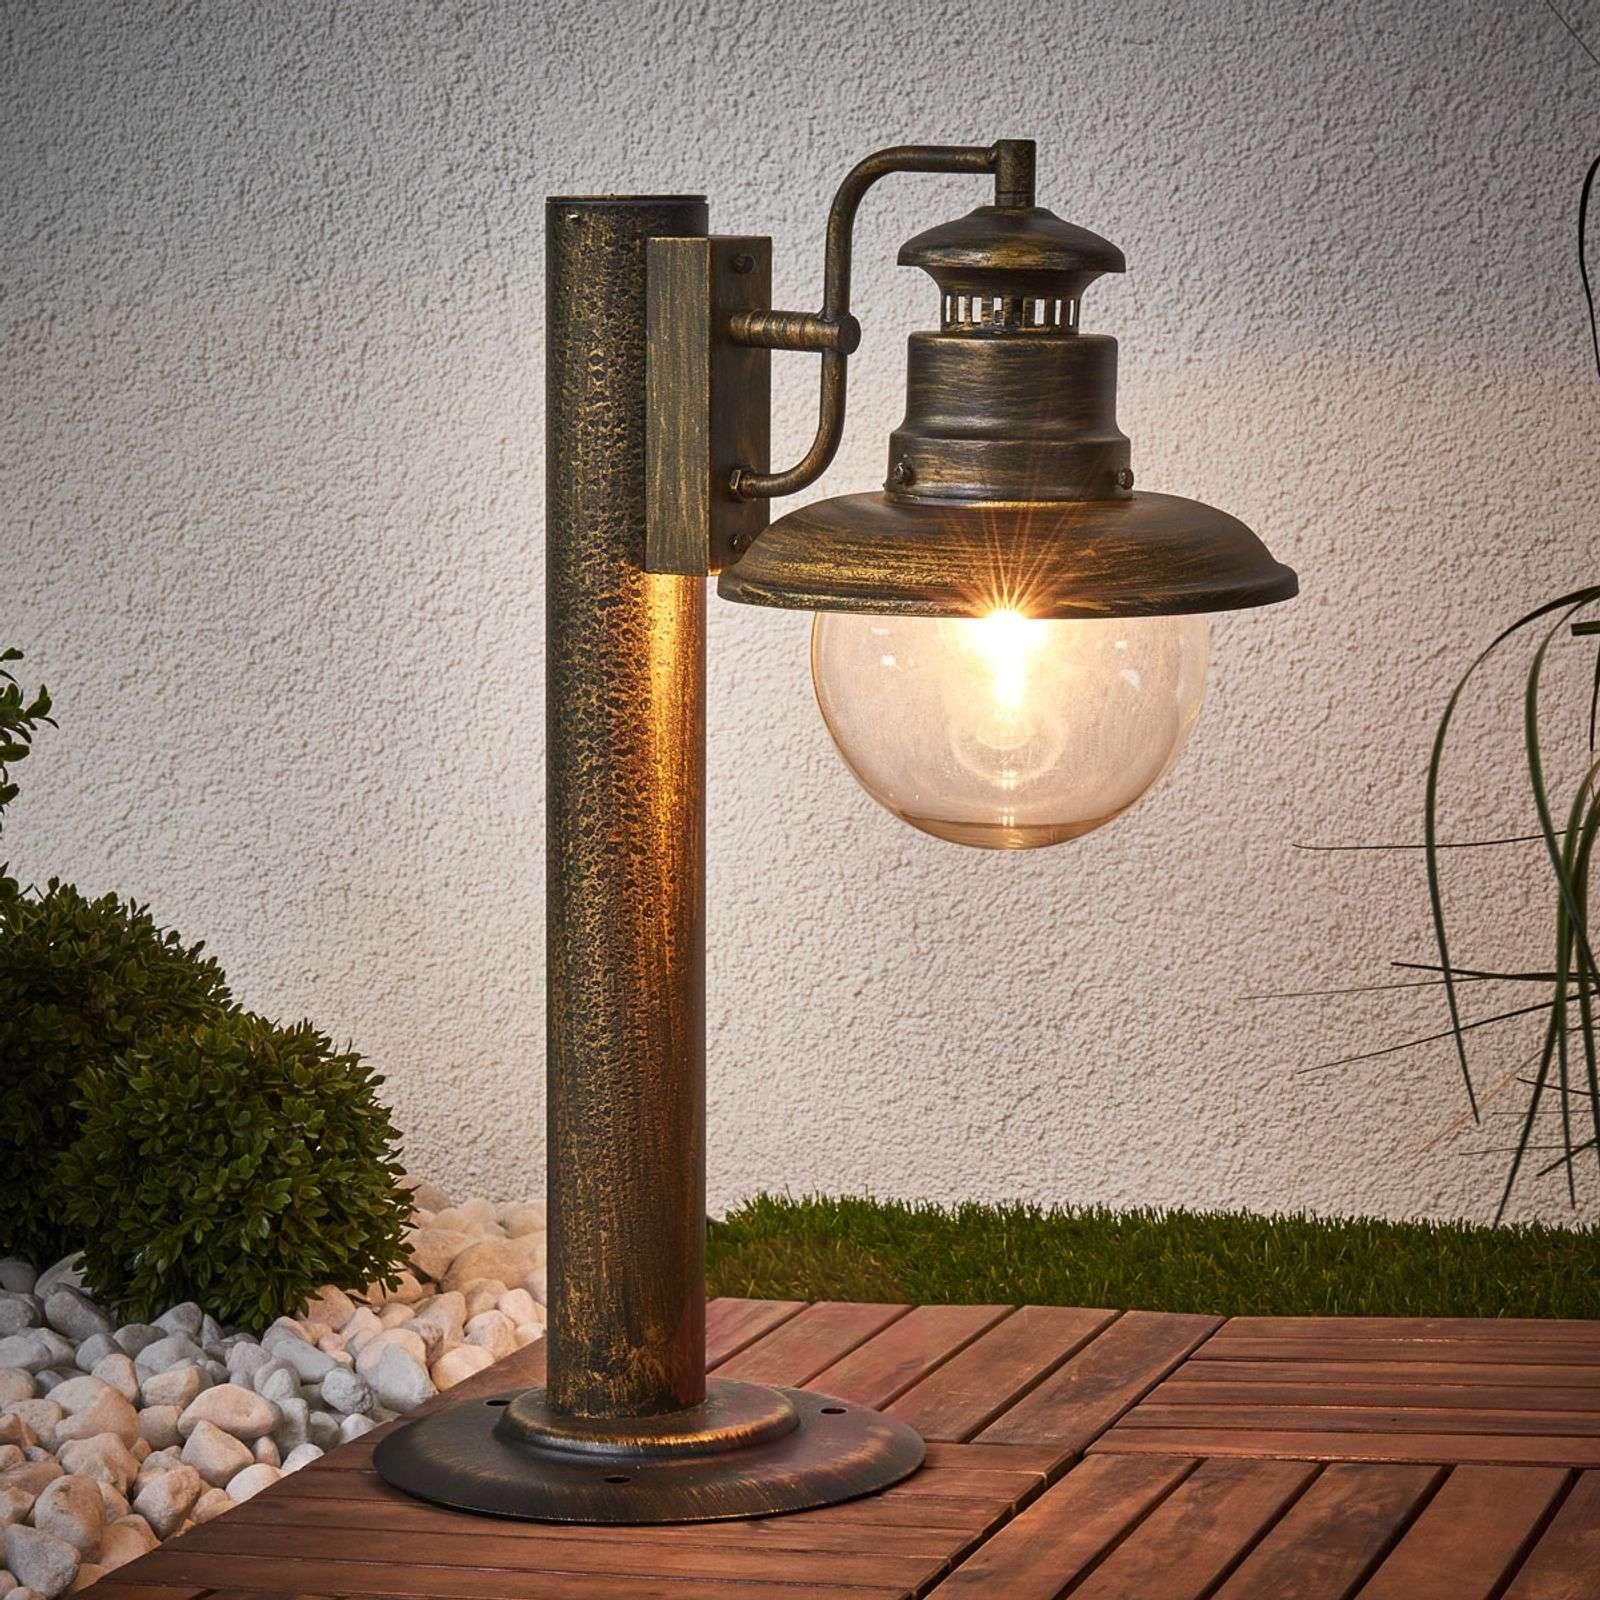 ARTU rustic pillar light, black-gold_1507154_1